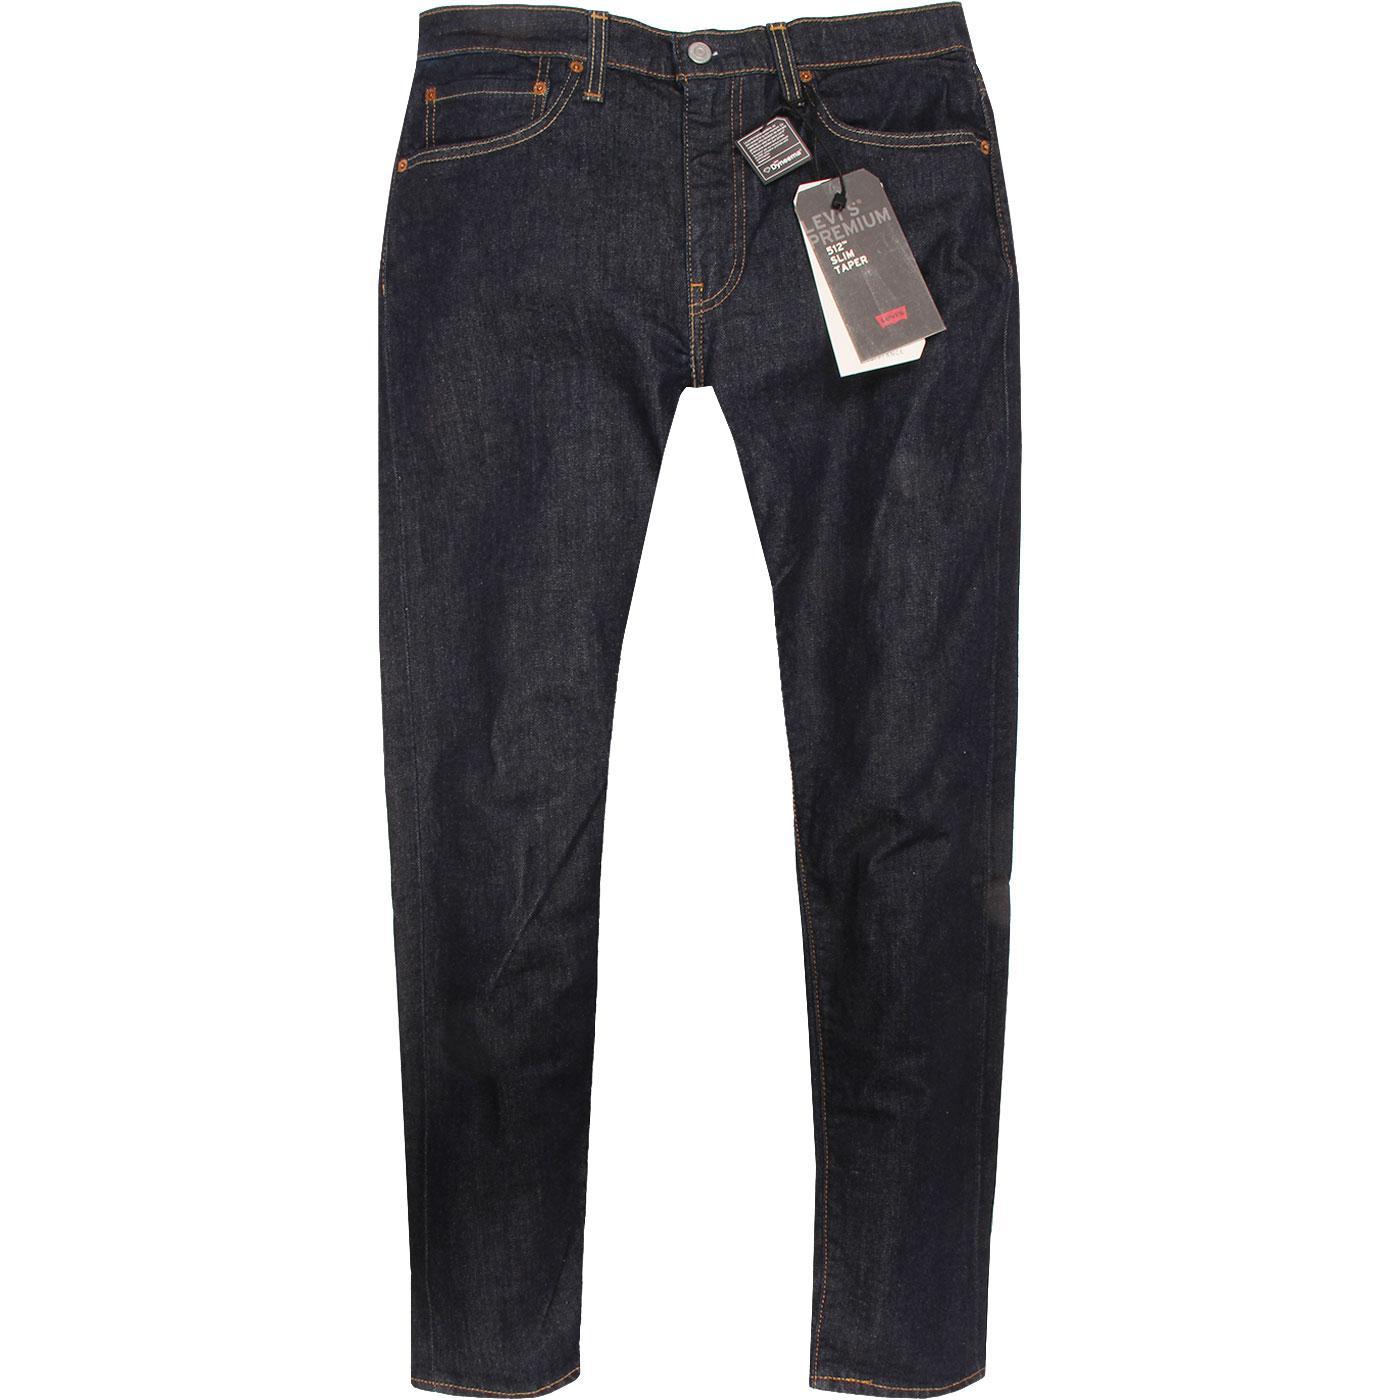 LEVI'S 512 Mod Slim Taper Denim Jeans ROCK COD